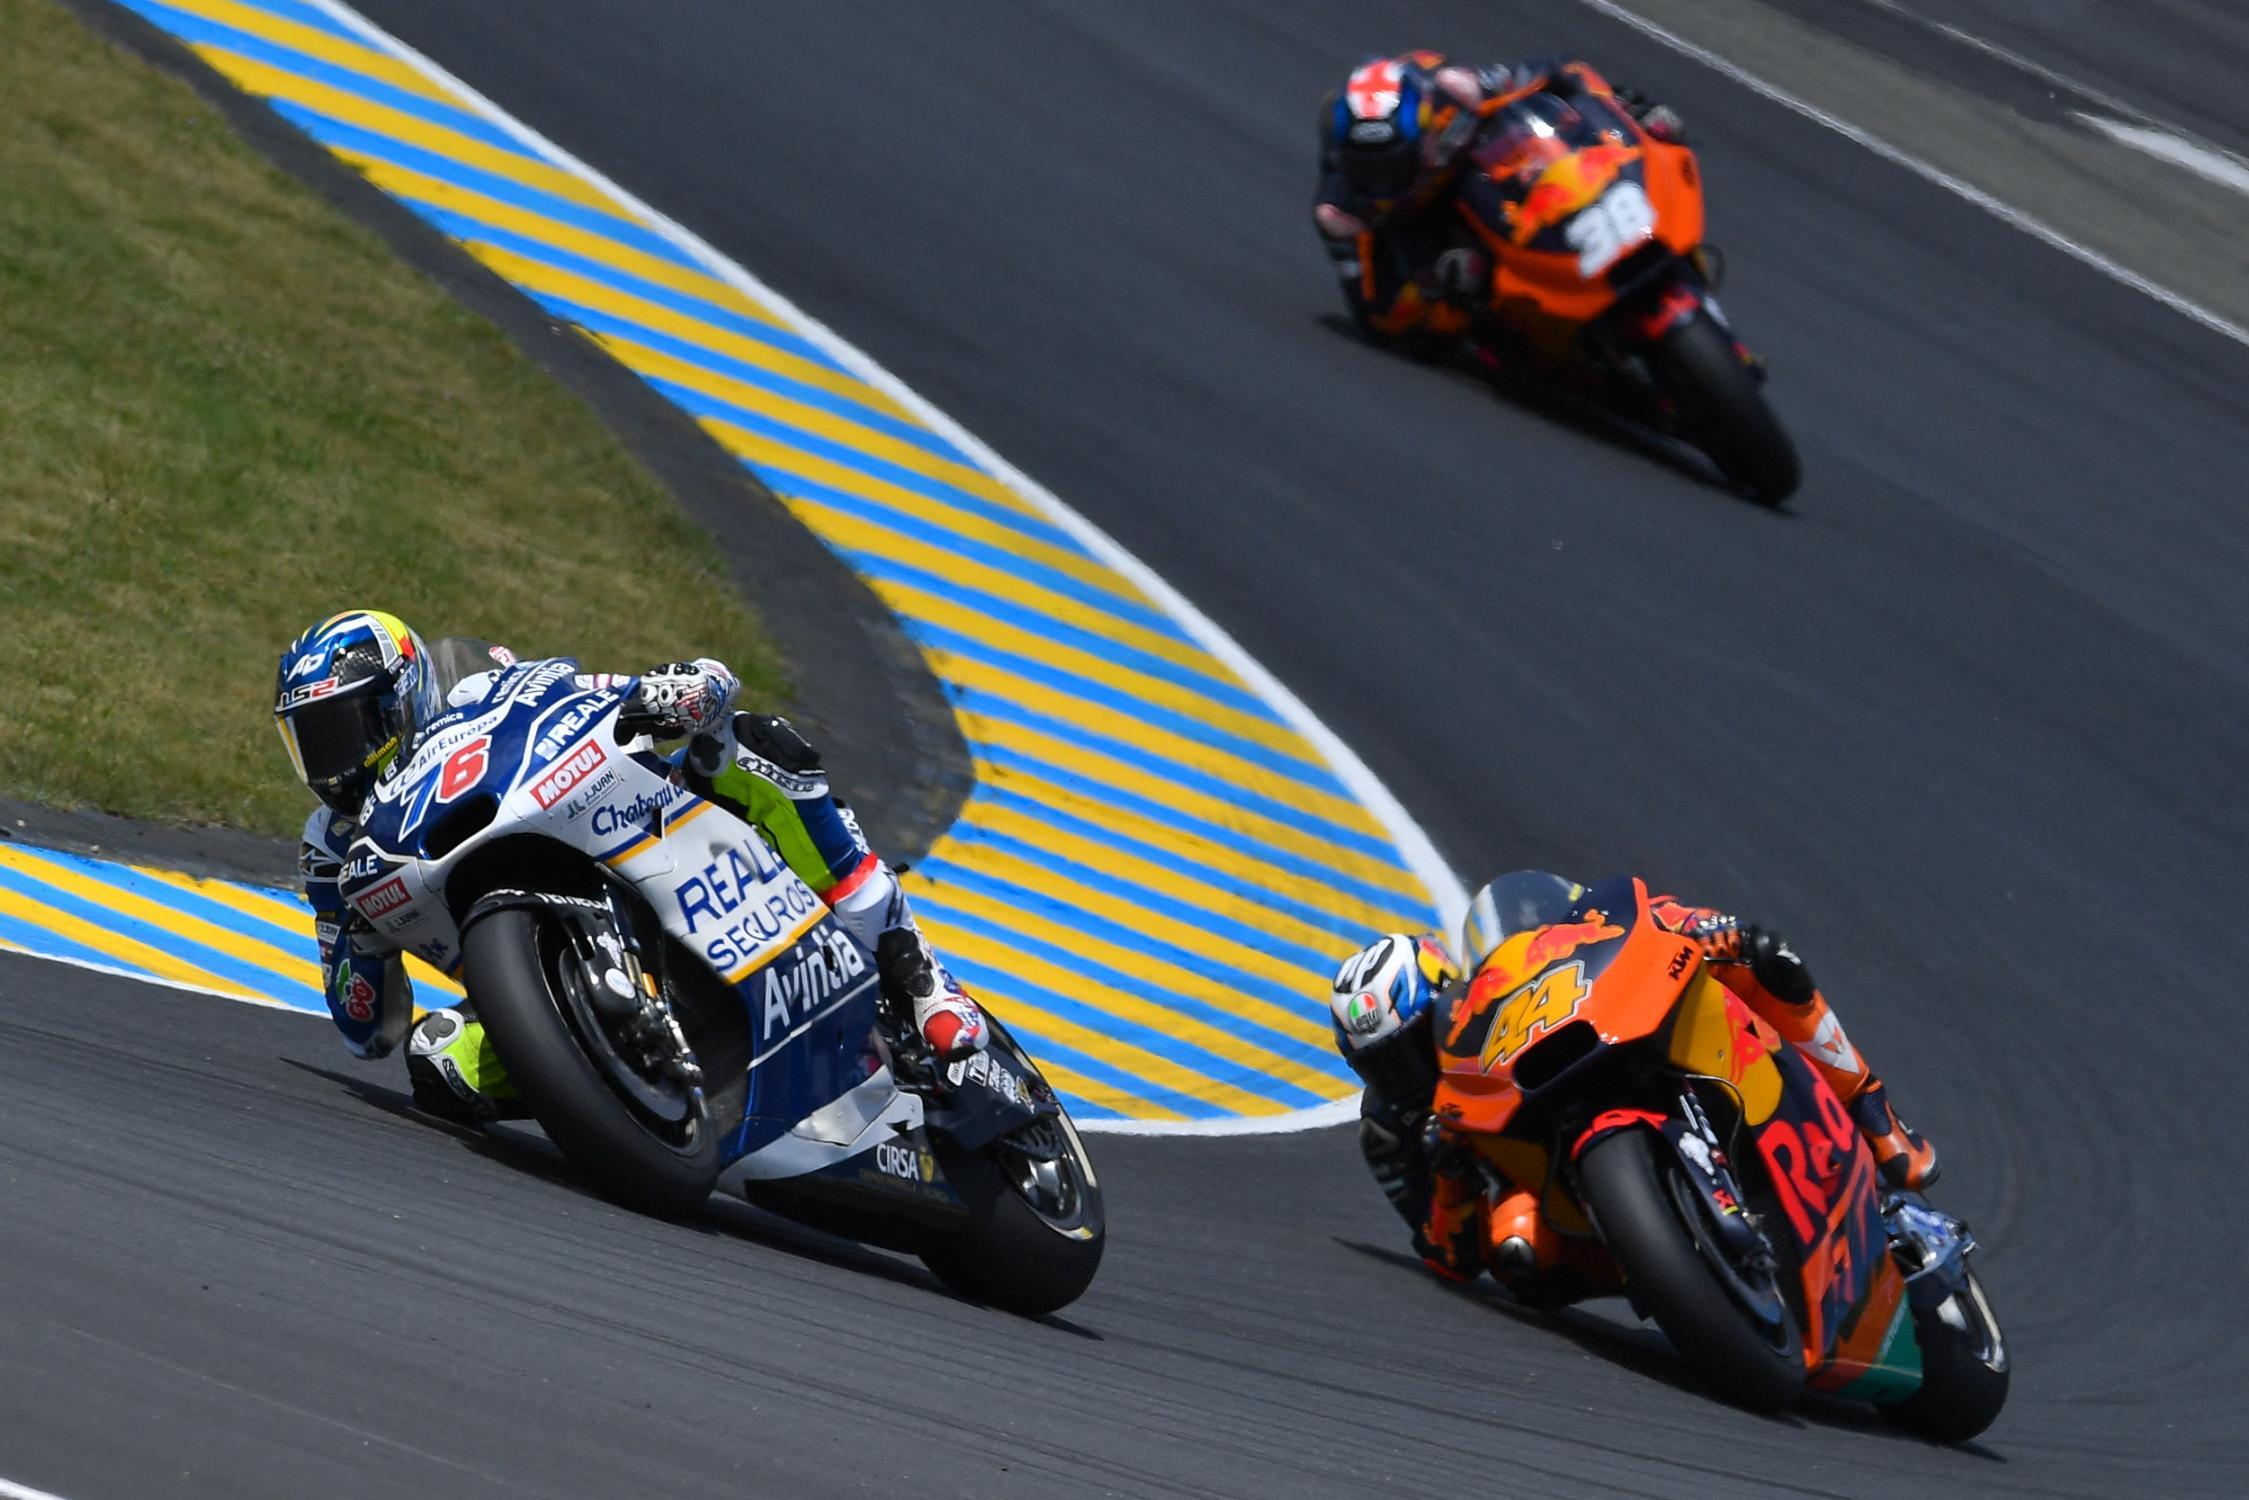 [GP] Le Mans 76-loris-baz-fralg5_1046.gallery_full_top_fullscreen